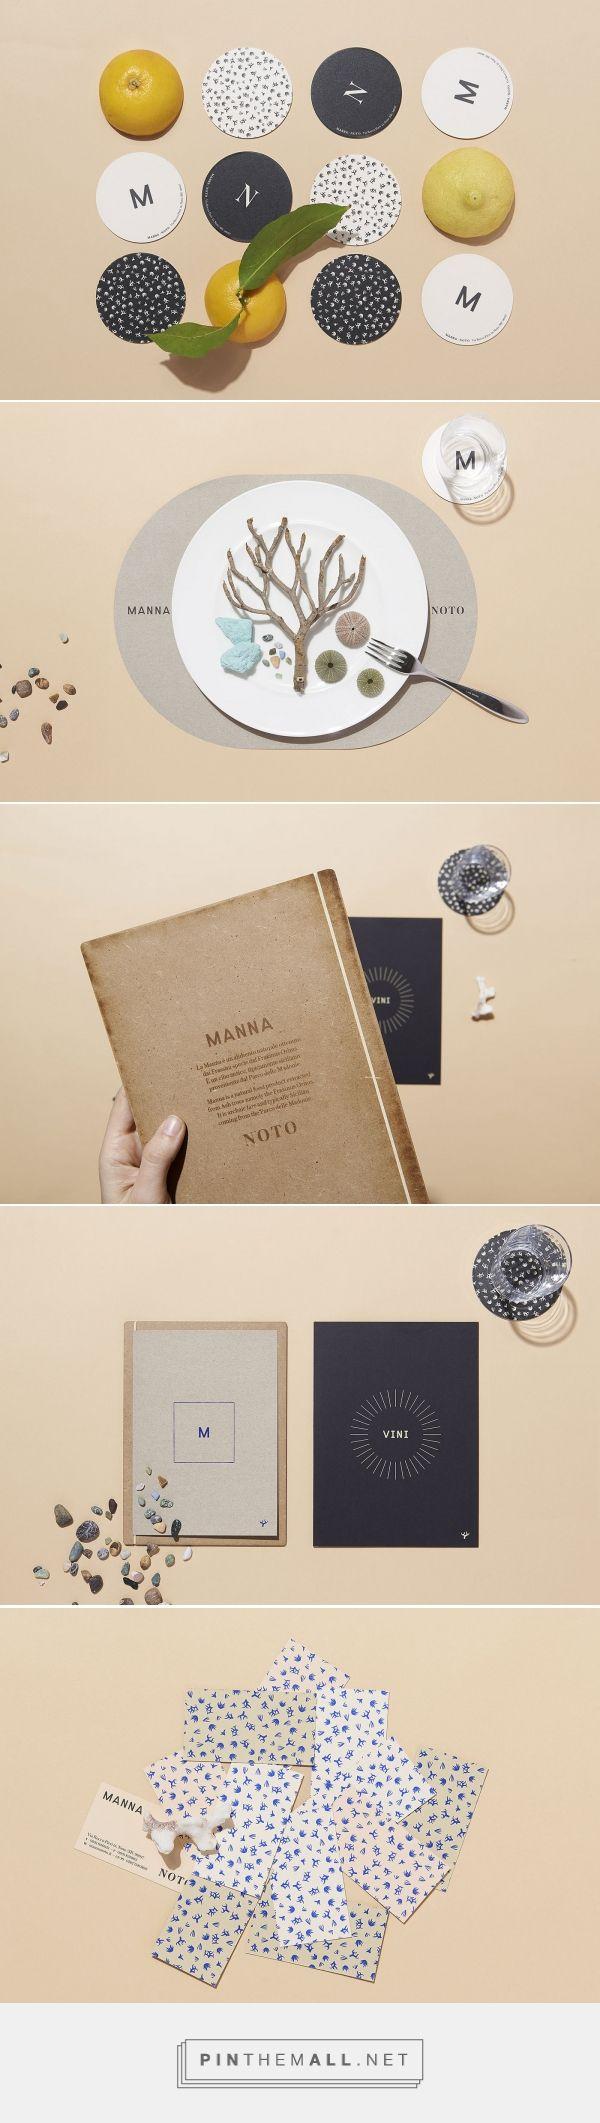 Manna Noto Bistrot Branding by La Tigre | Fivestar Branding Agency – Design and Branding Agency & Curated Inspiration Gallery